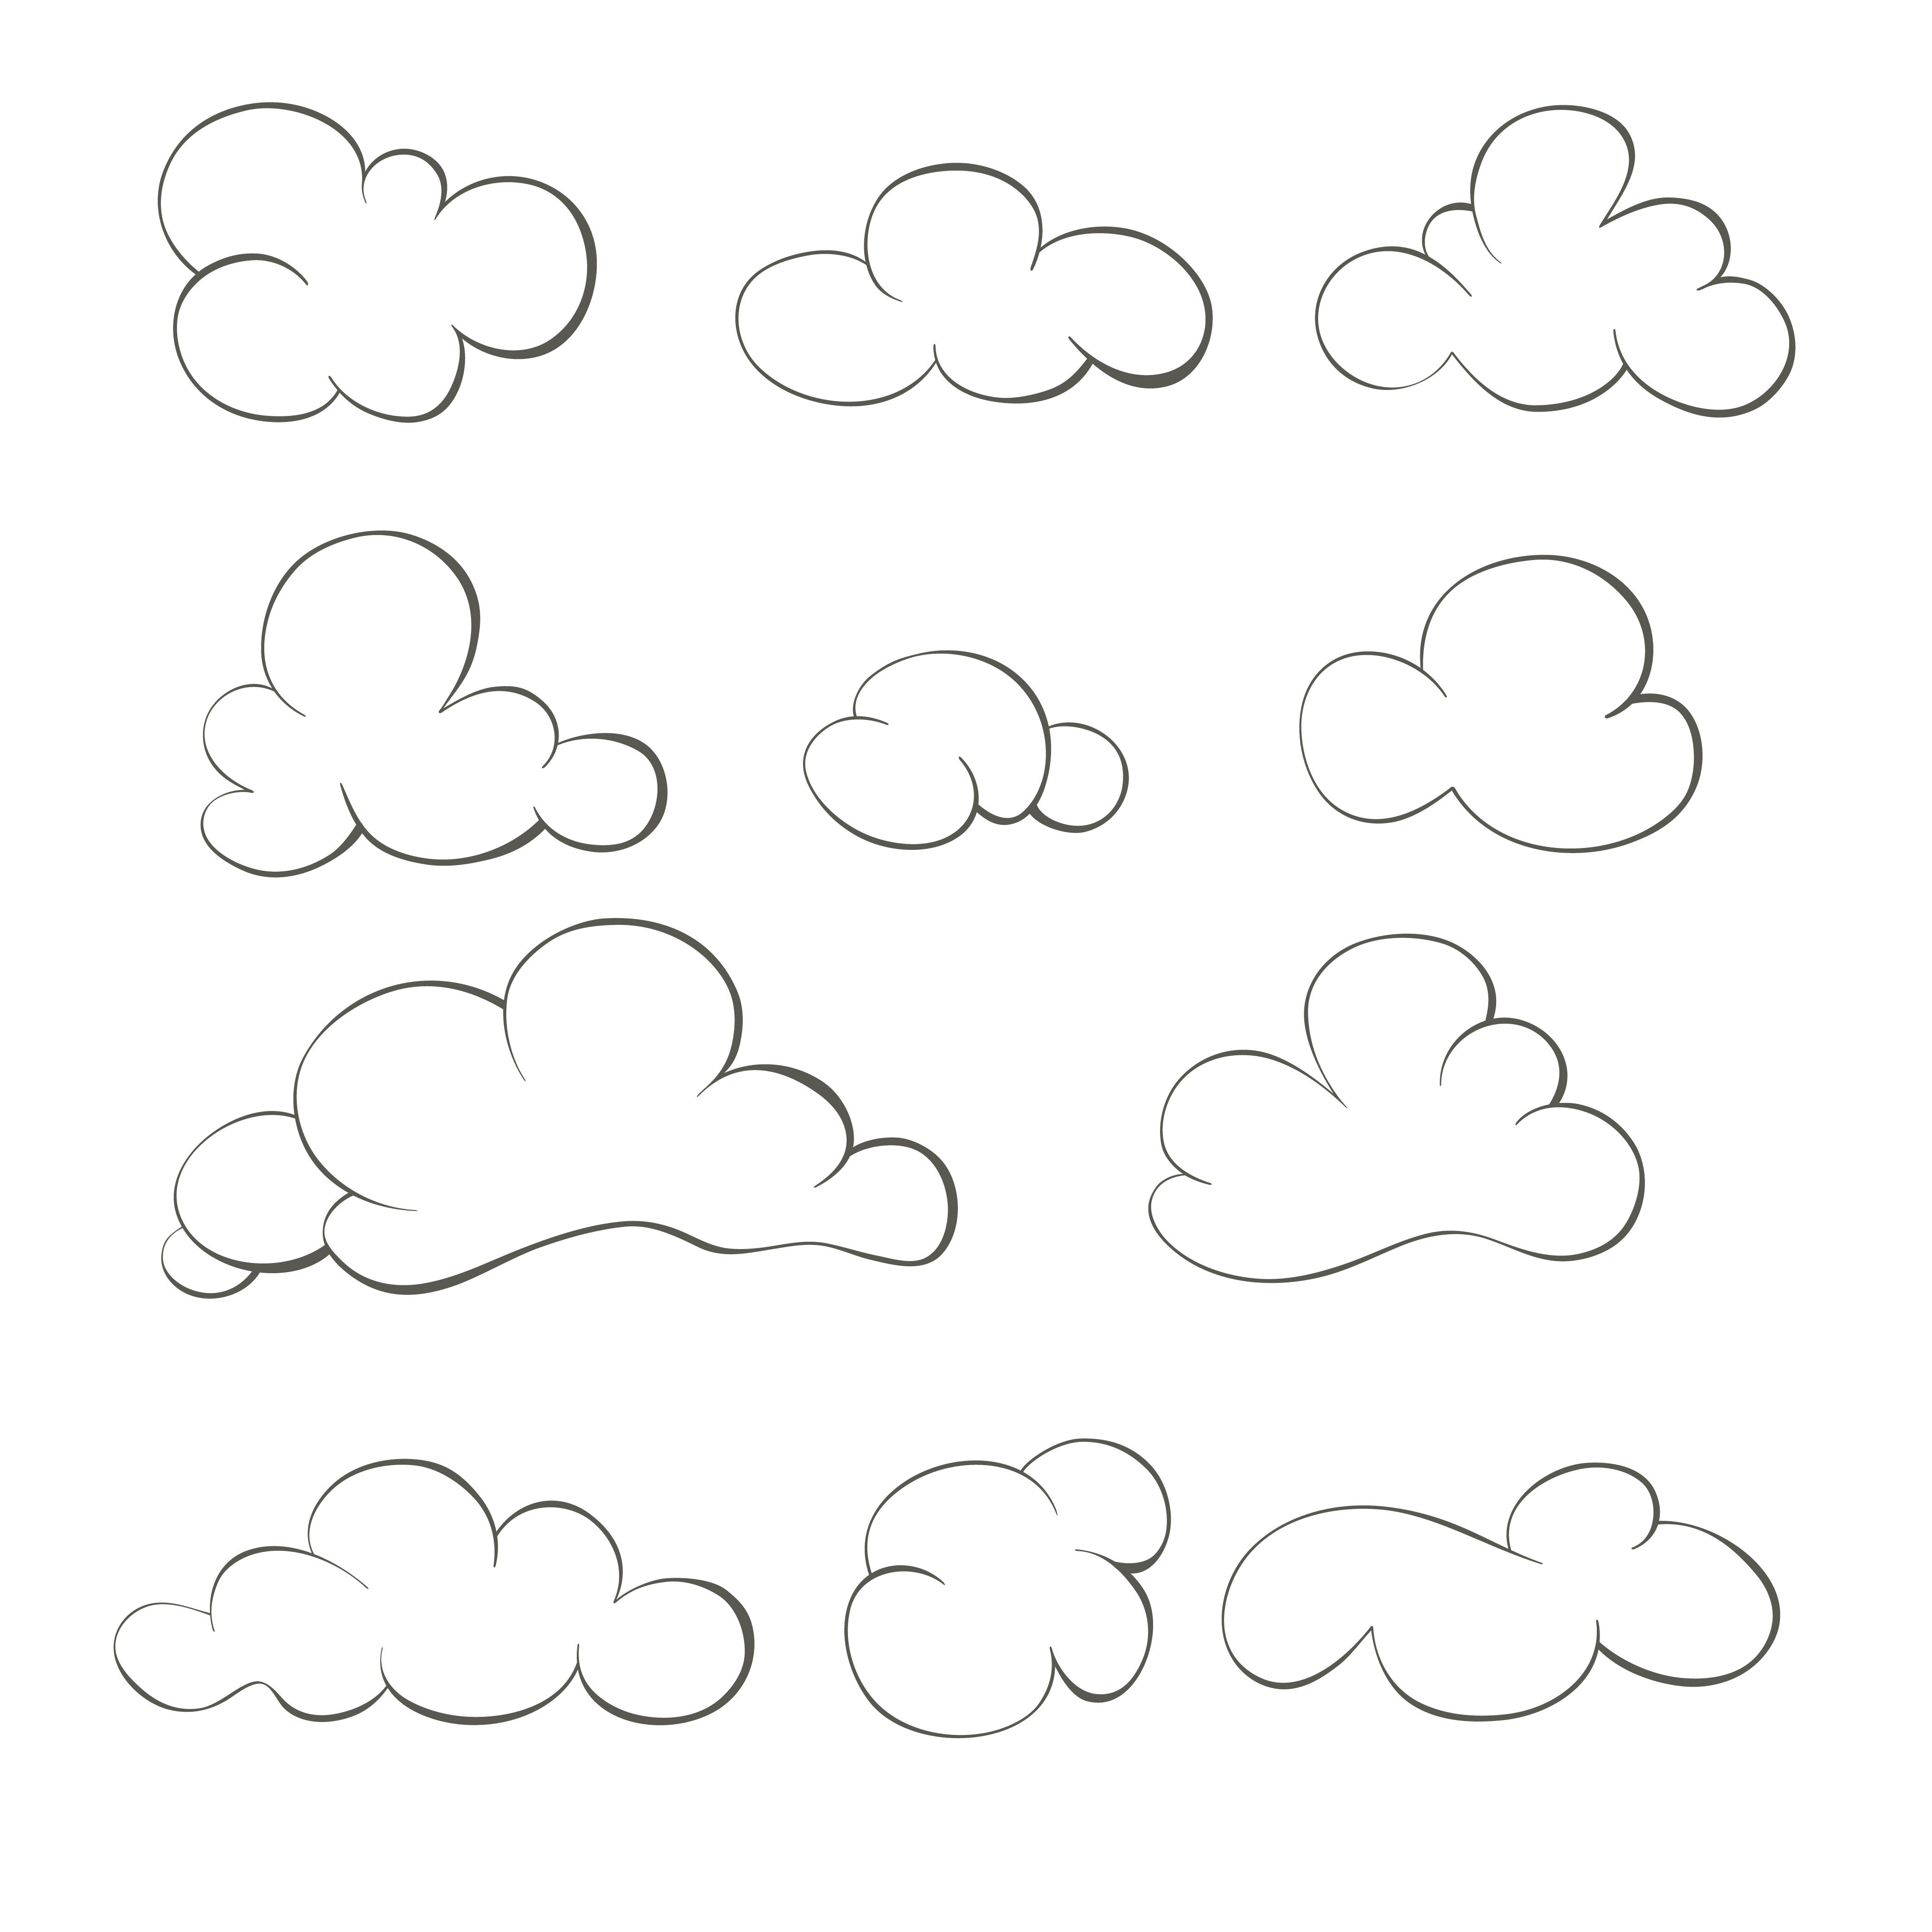 Pin By Dara Wirantika On Graphics Design Cloud Illustration Cloud Drawing Cloud Stencil